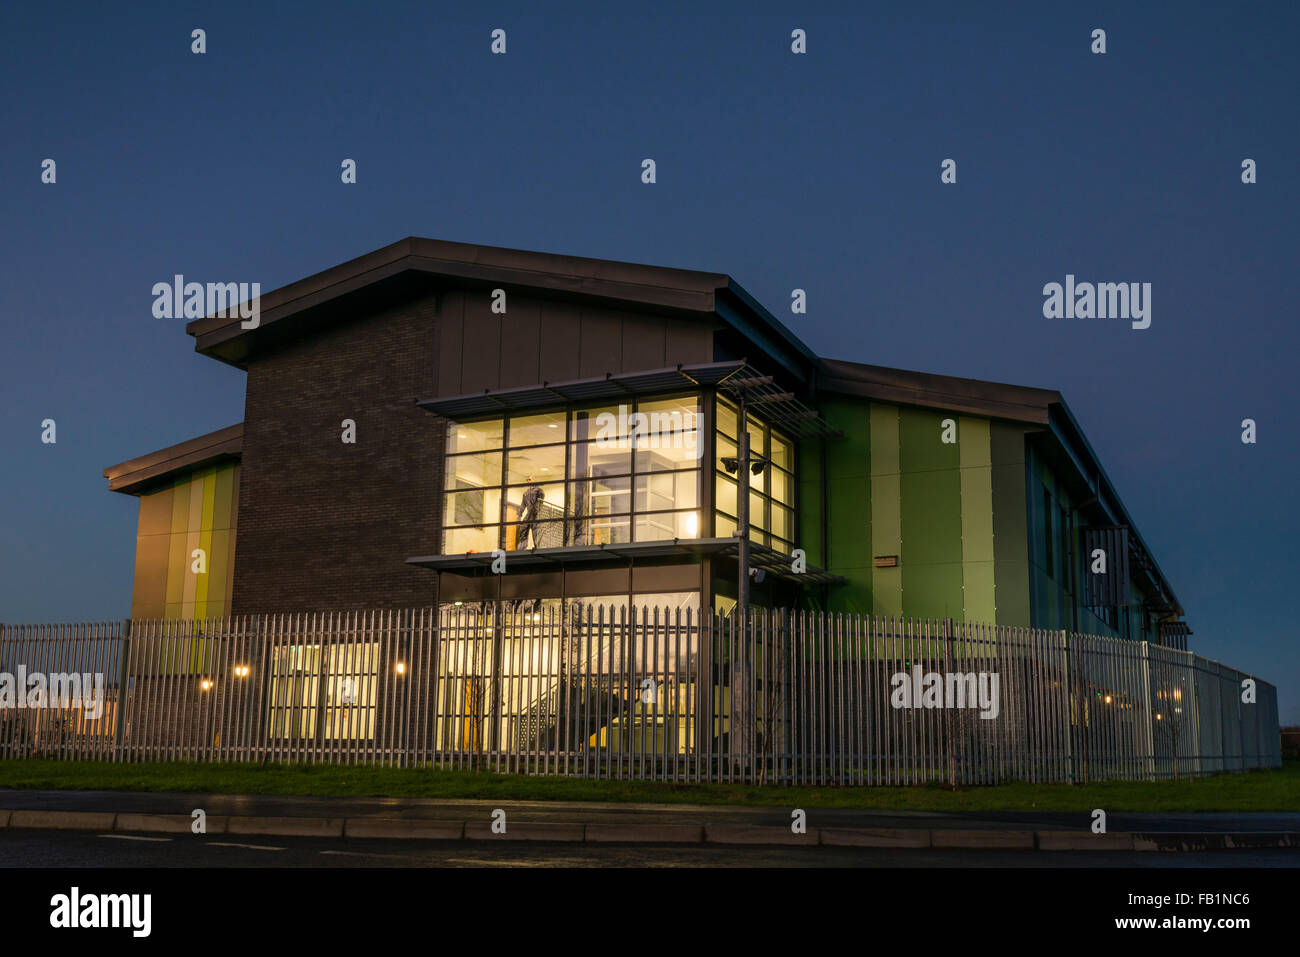 Commercial real estate industrial unit exterior taken at dusk, UK. Mannequin in window. - Stock Image